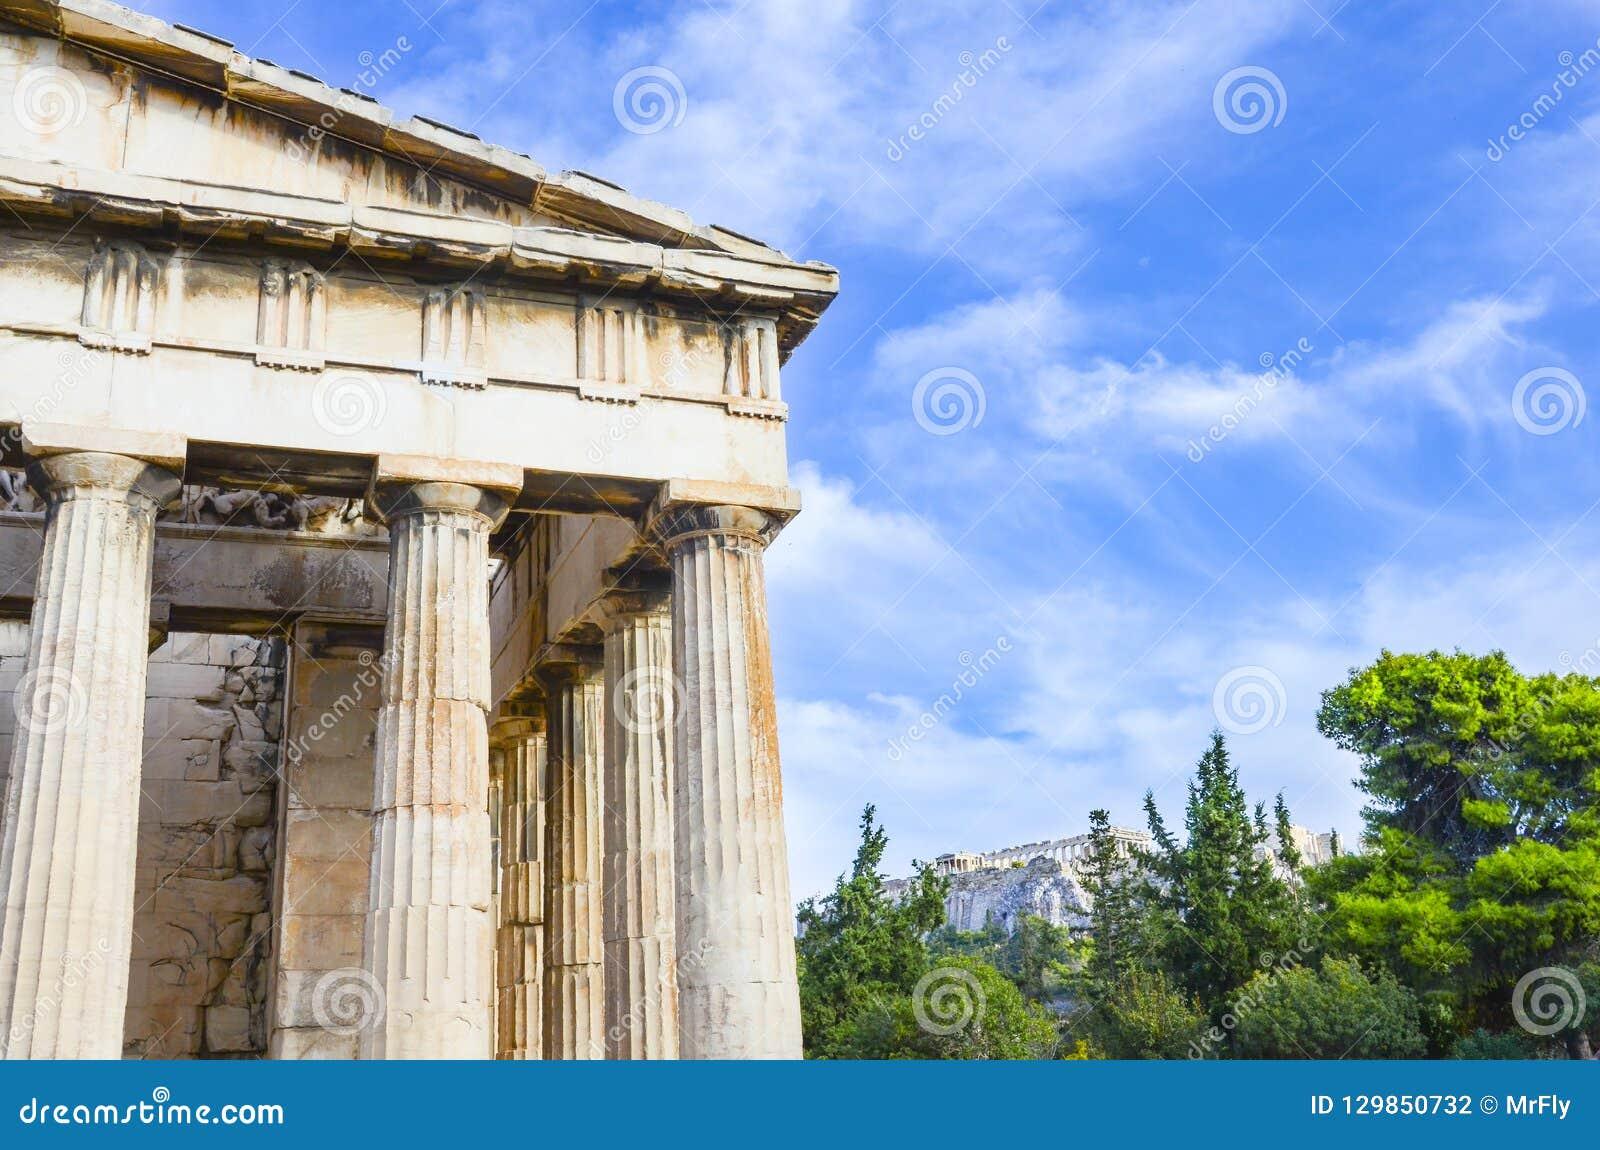 Athens Greece hephaestus świątynia